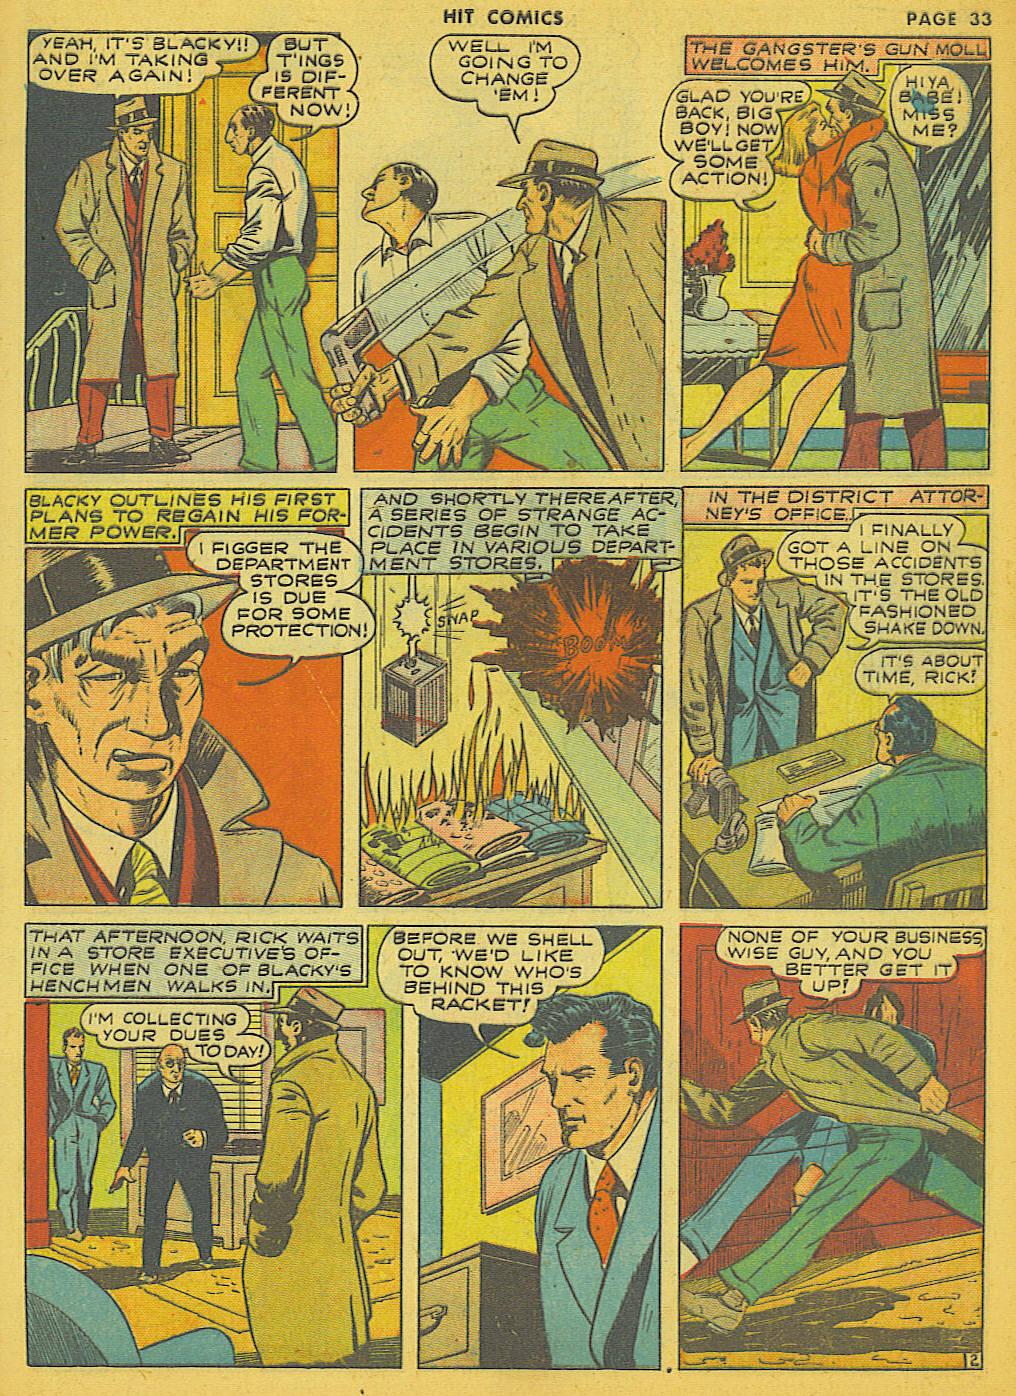 Read online Hit Comics comic -  Issue #21 - 35